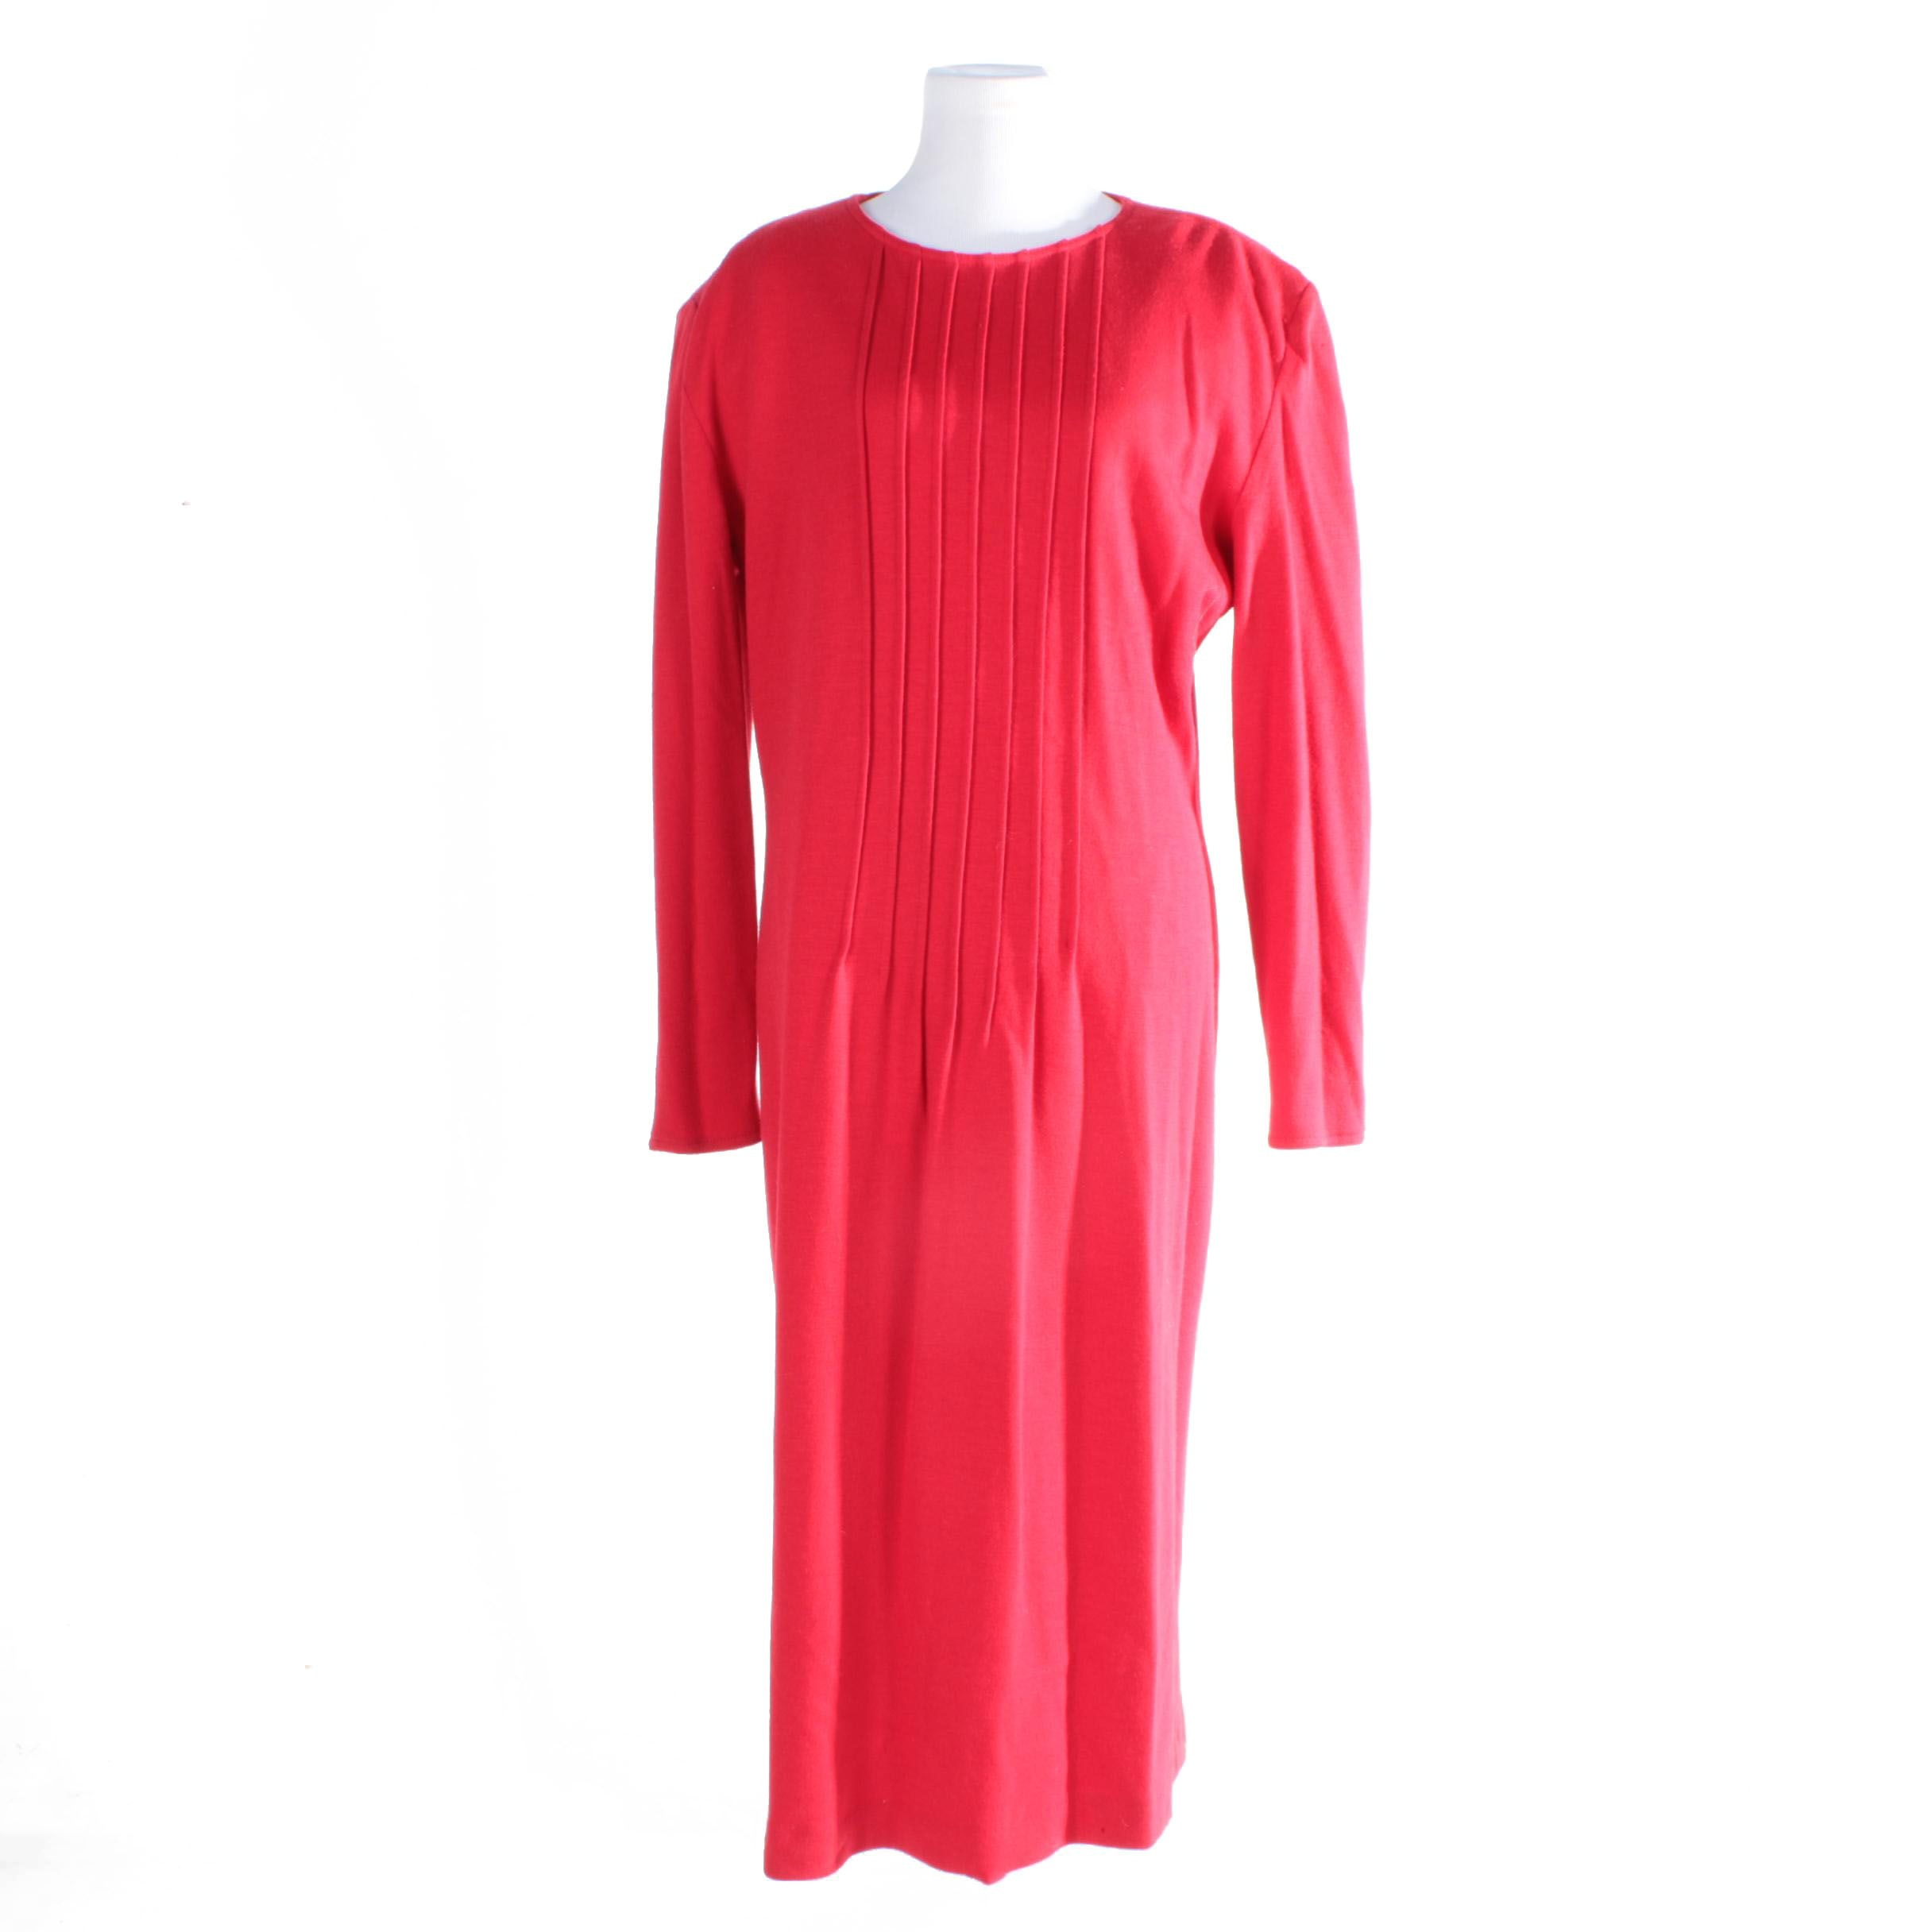 Giorgio Armani Wool Dress